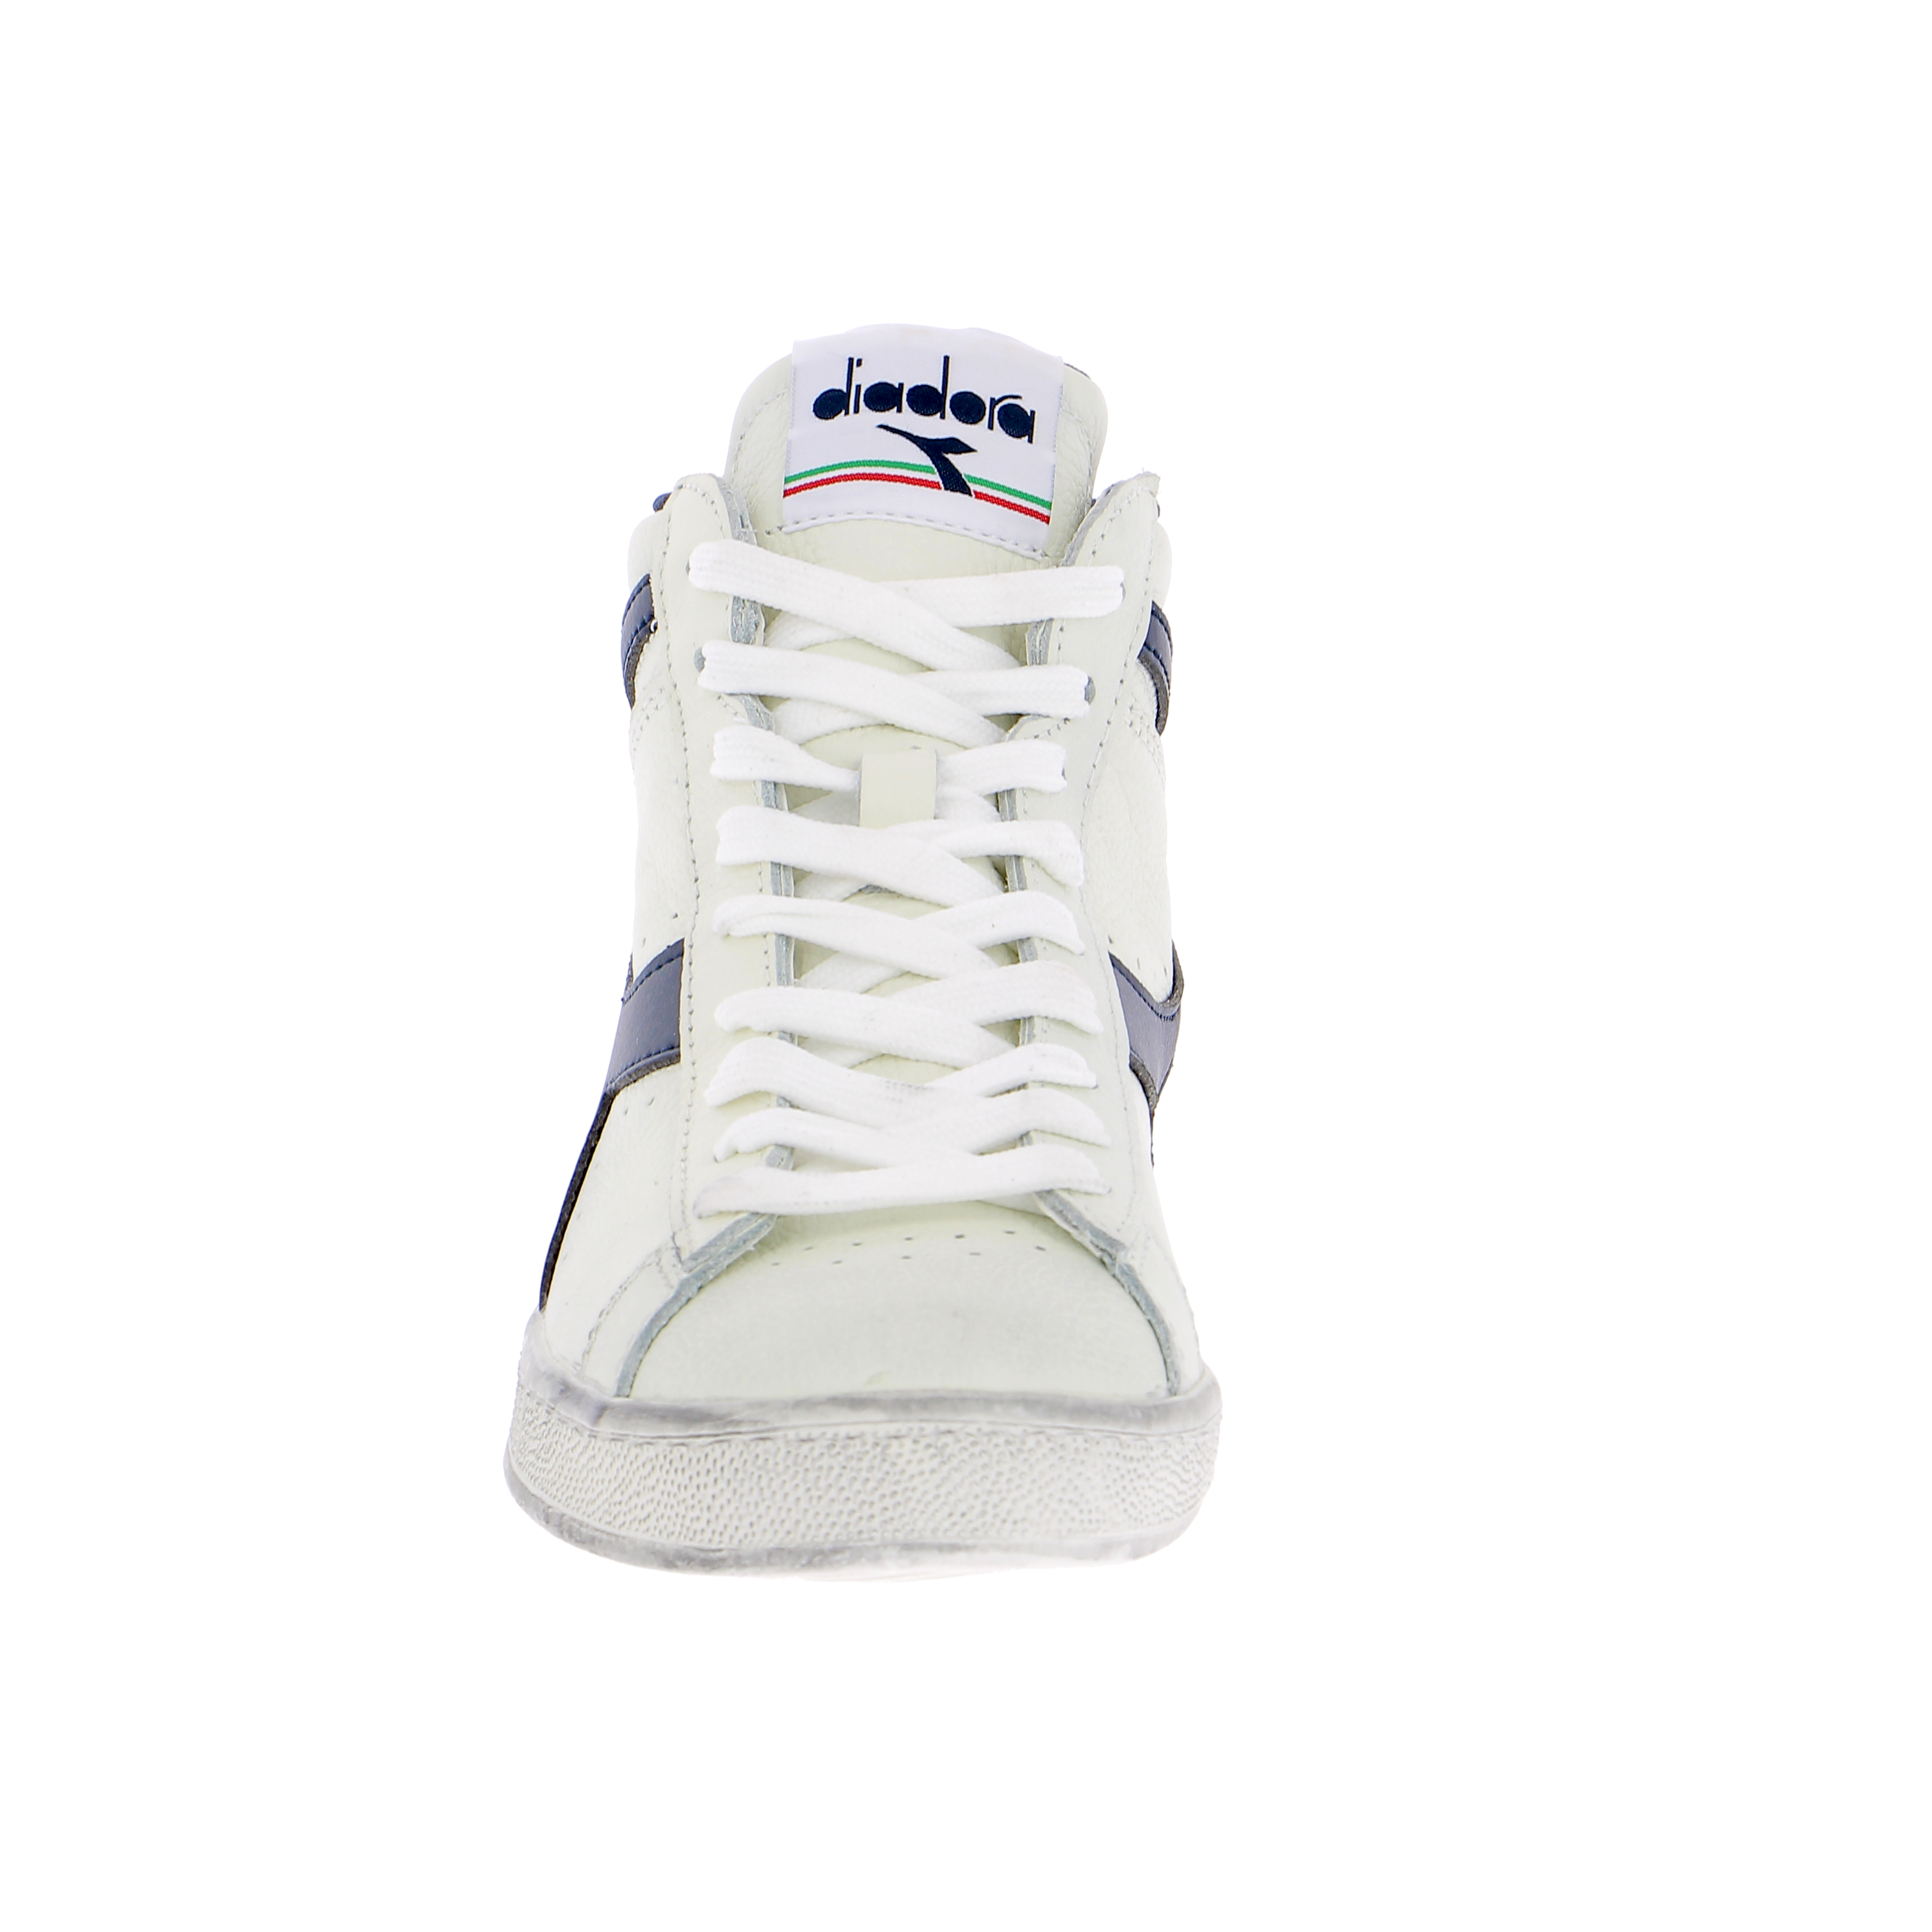 Diadora Basket bleu